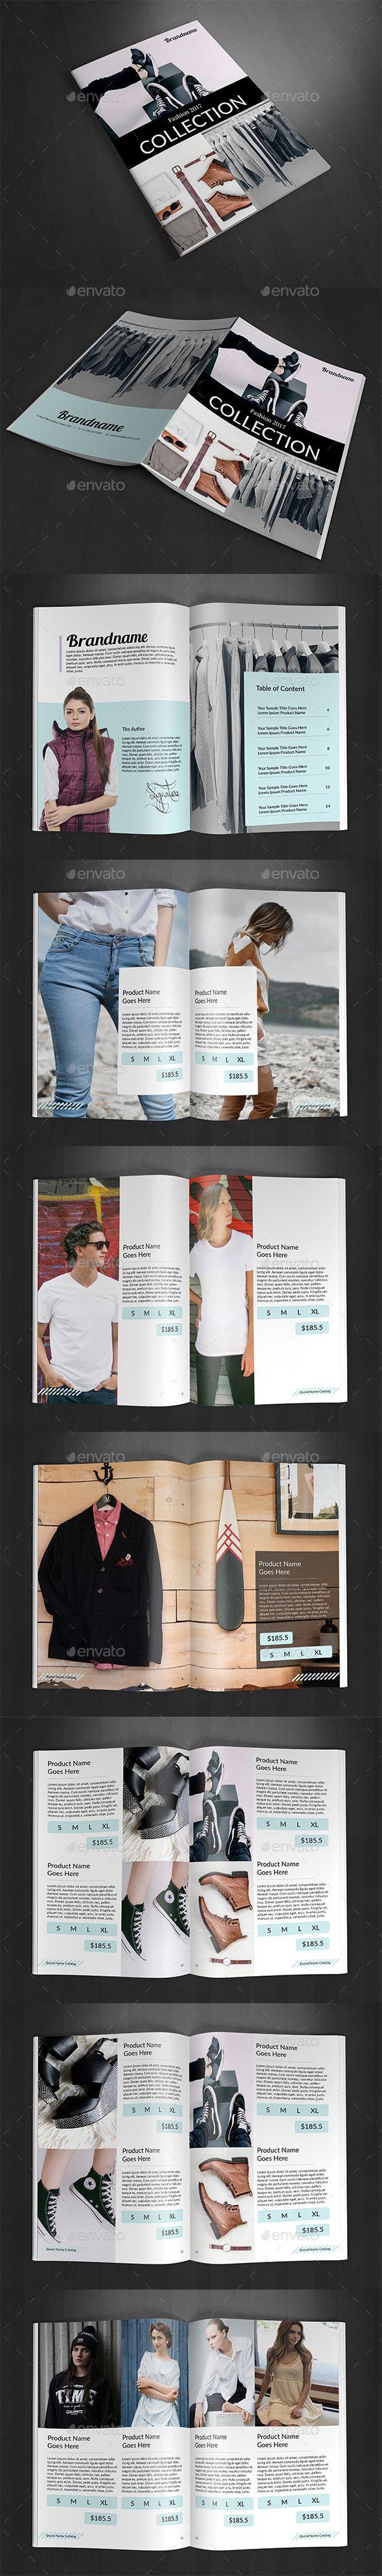 95 best Product Catalog Template & Design images on Pinterest